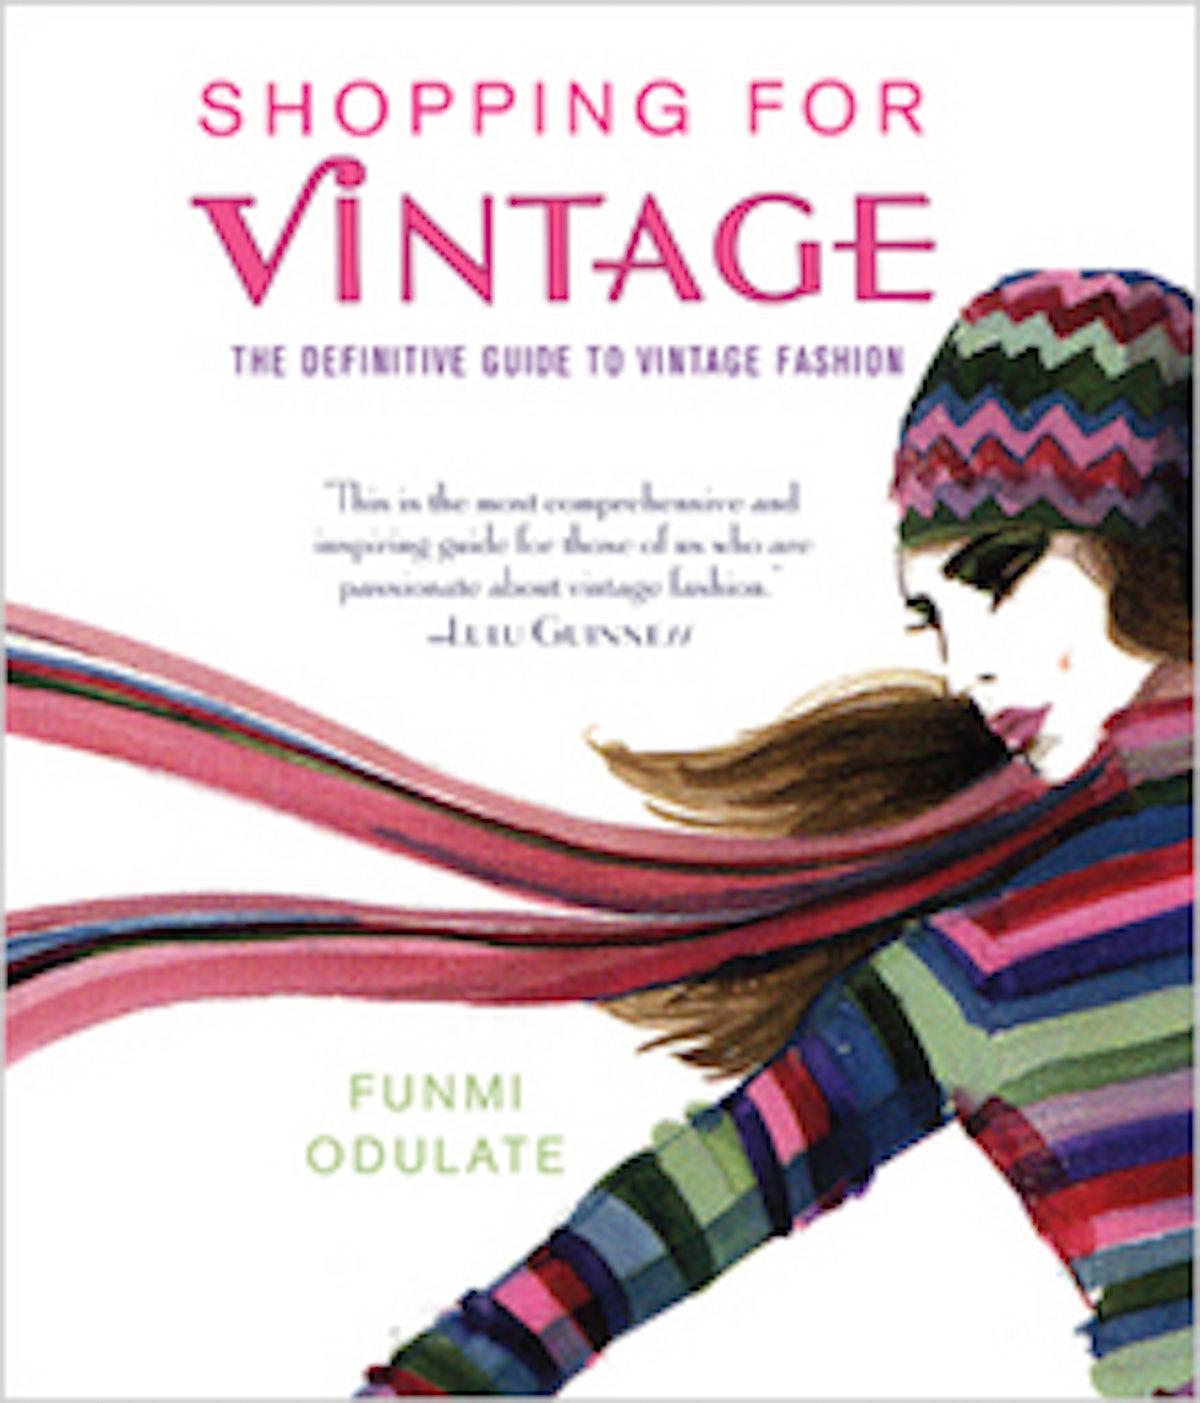 blog_vintage_book-thumb-220x256.jpg